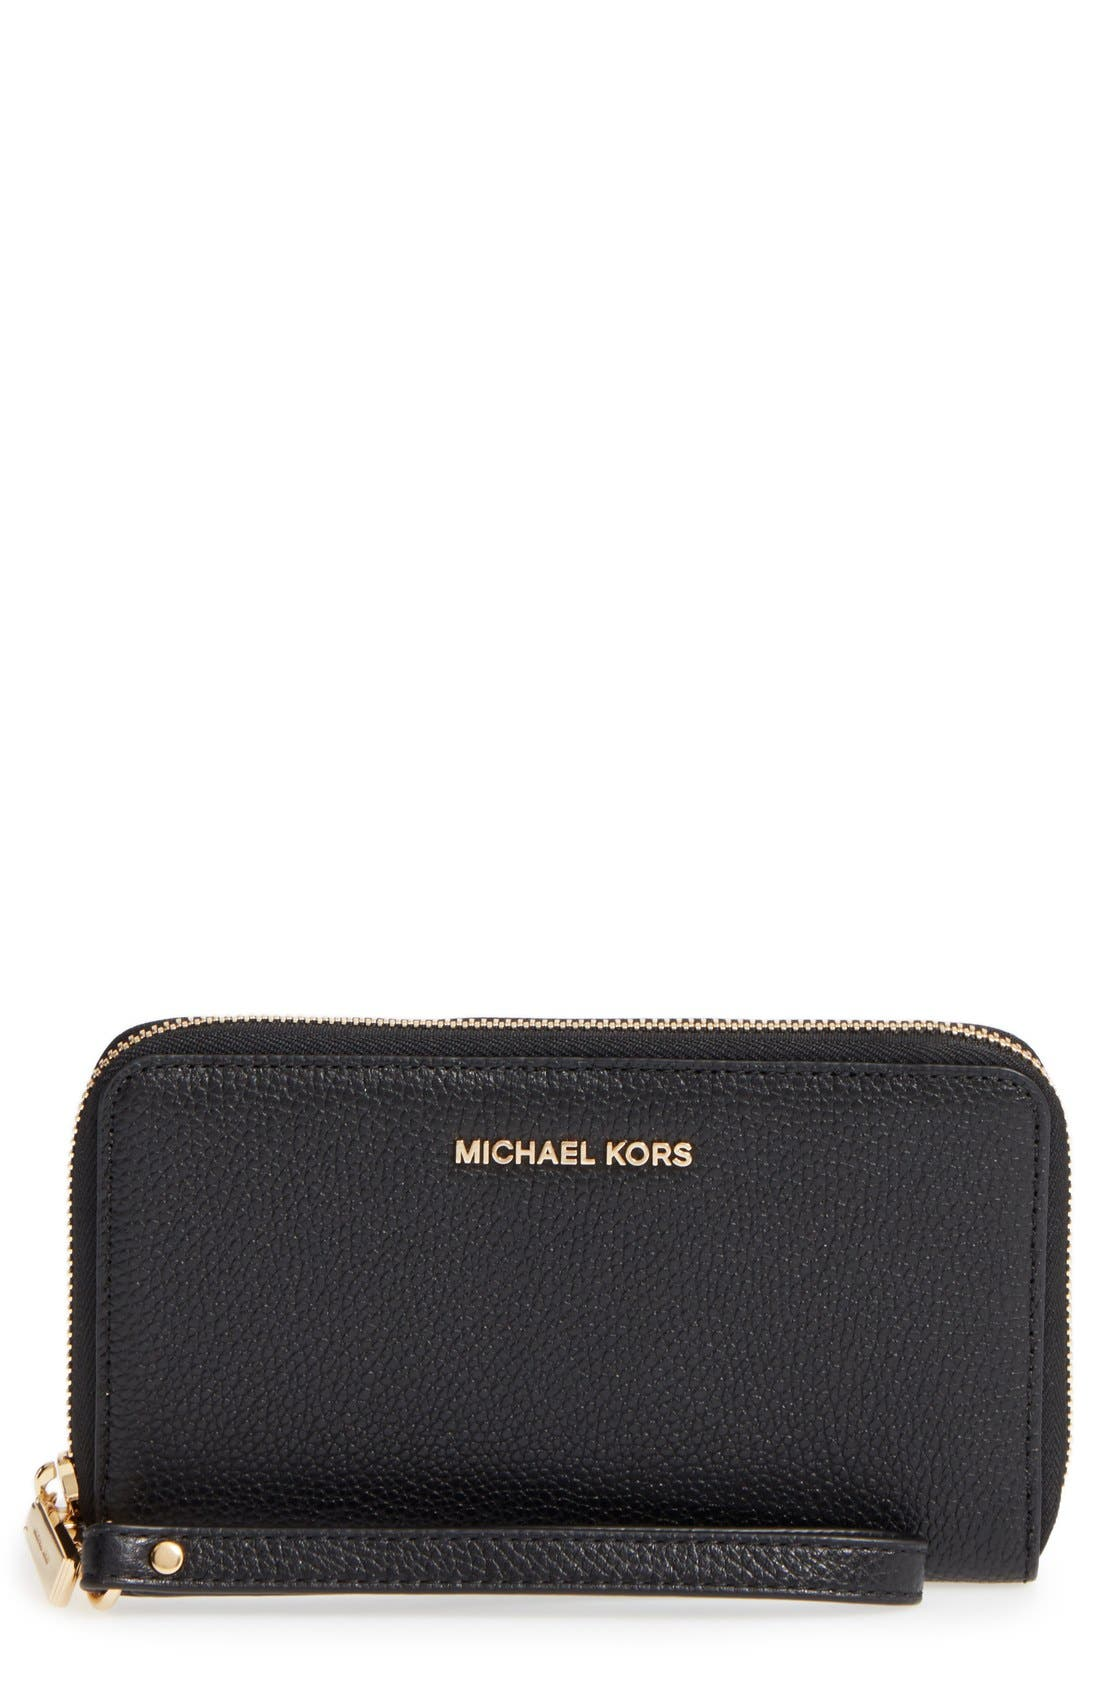 Main Image - MICHAEL Michael Kors Mercer Large Leather Tech Wristlet